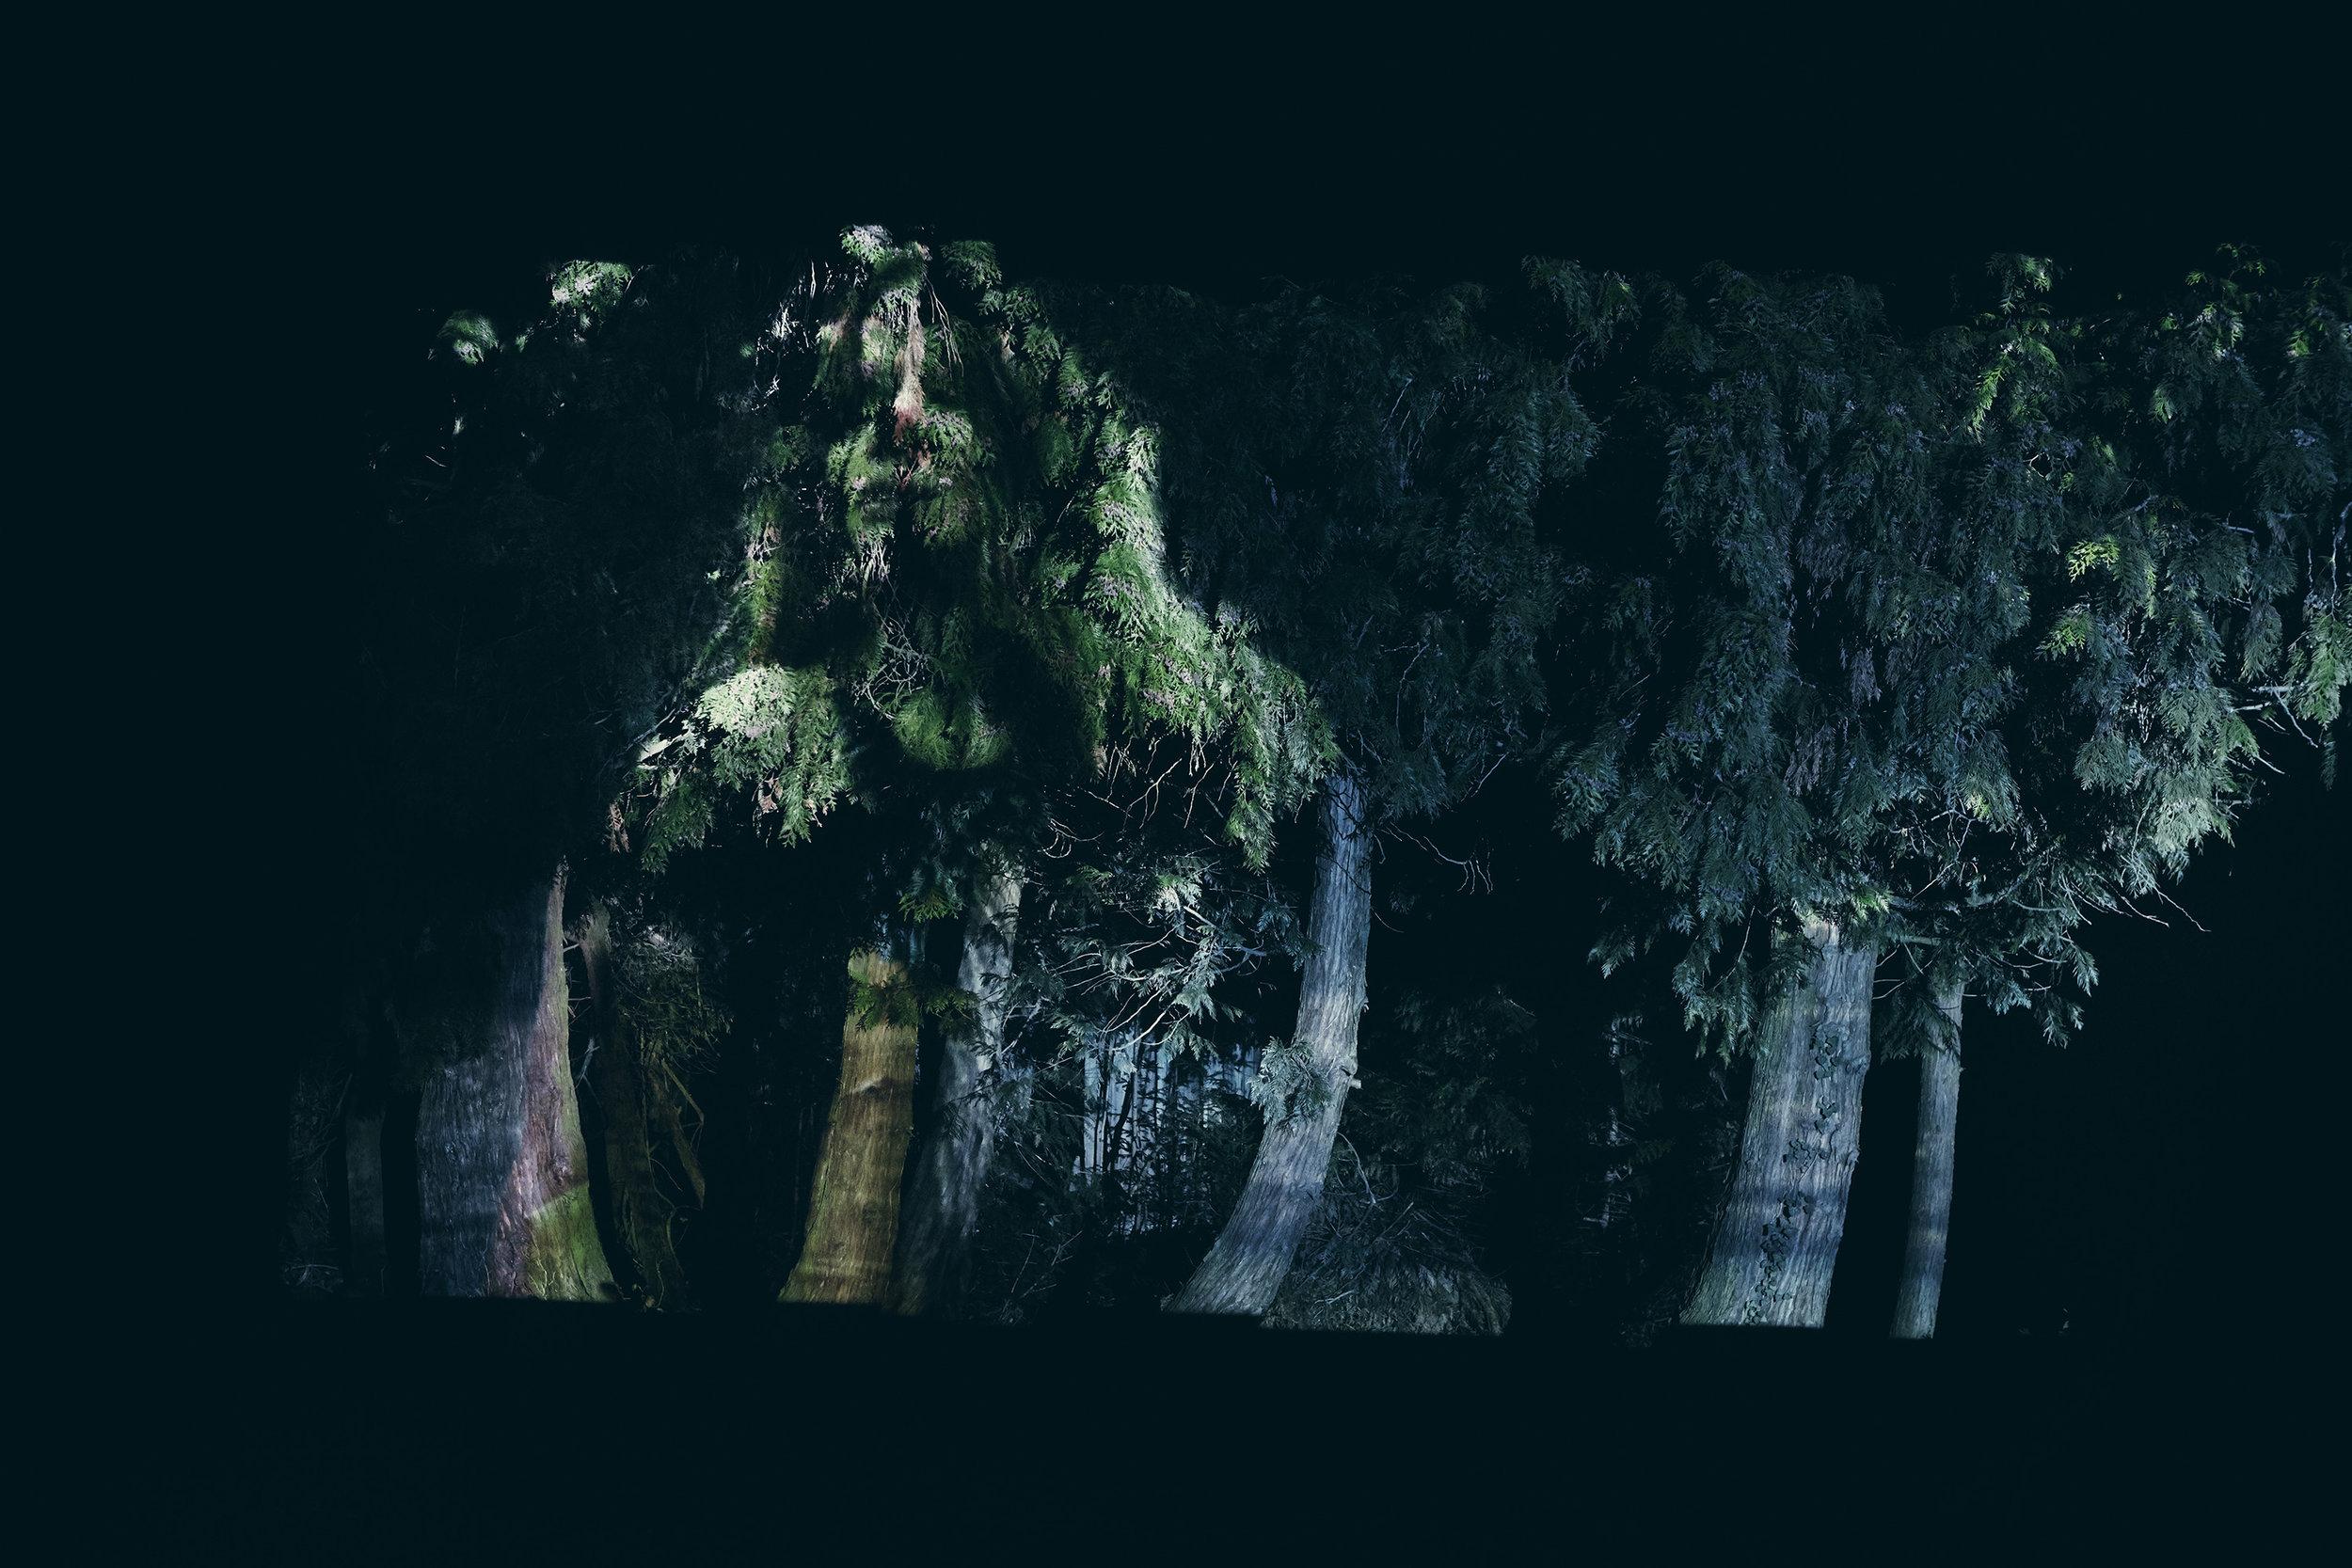 Anatol de cap rouge - crumbling decadence - trees